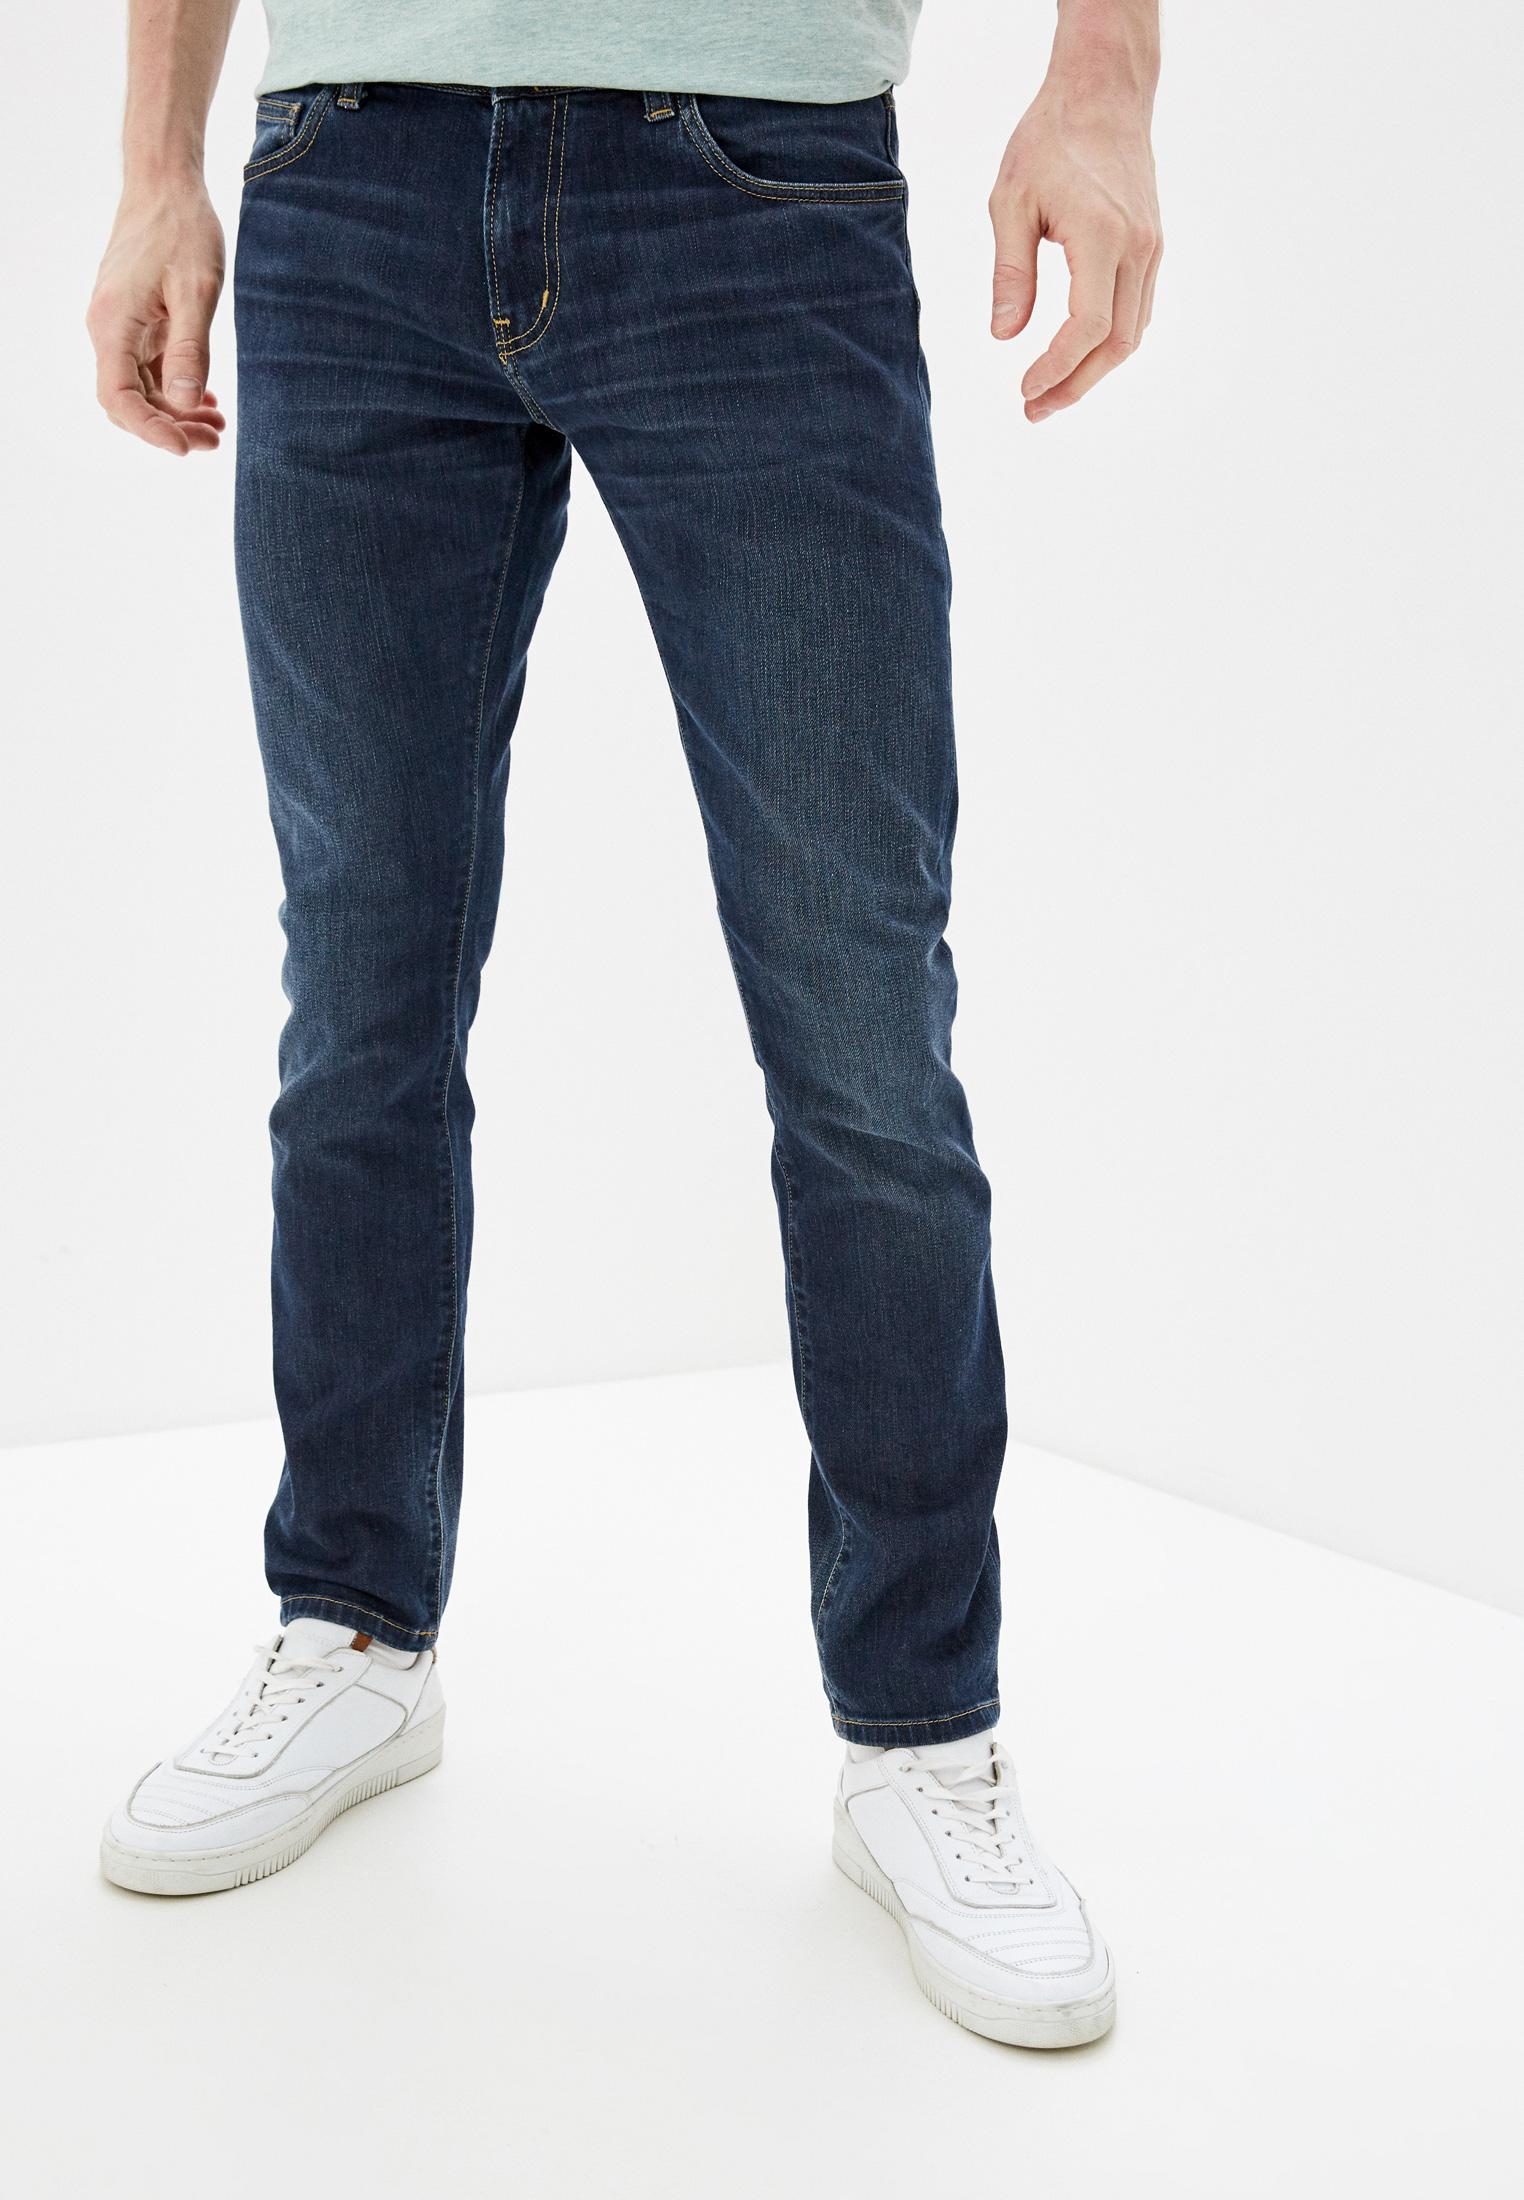 Зауженные джинсы Carhartt WIP I015331